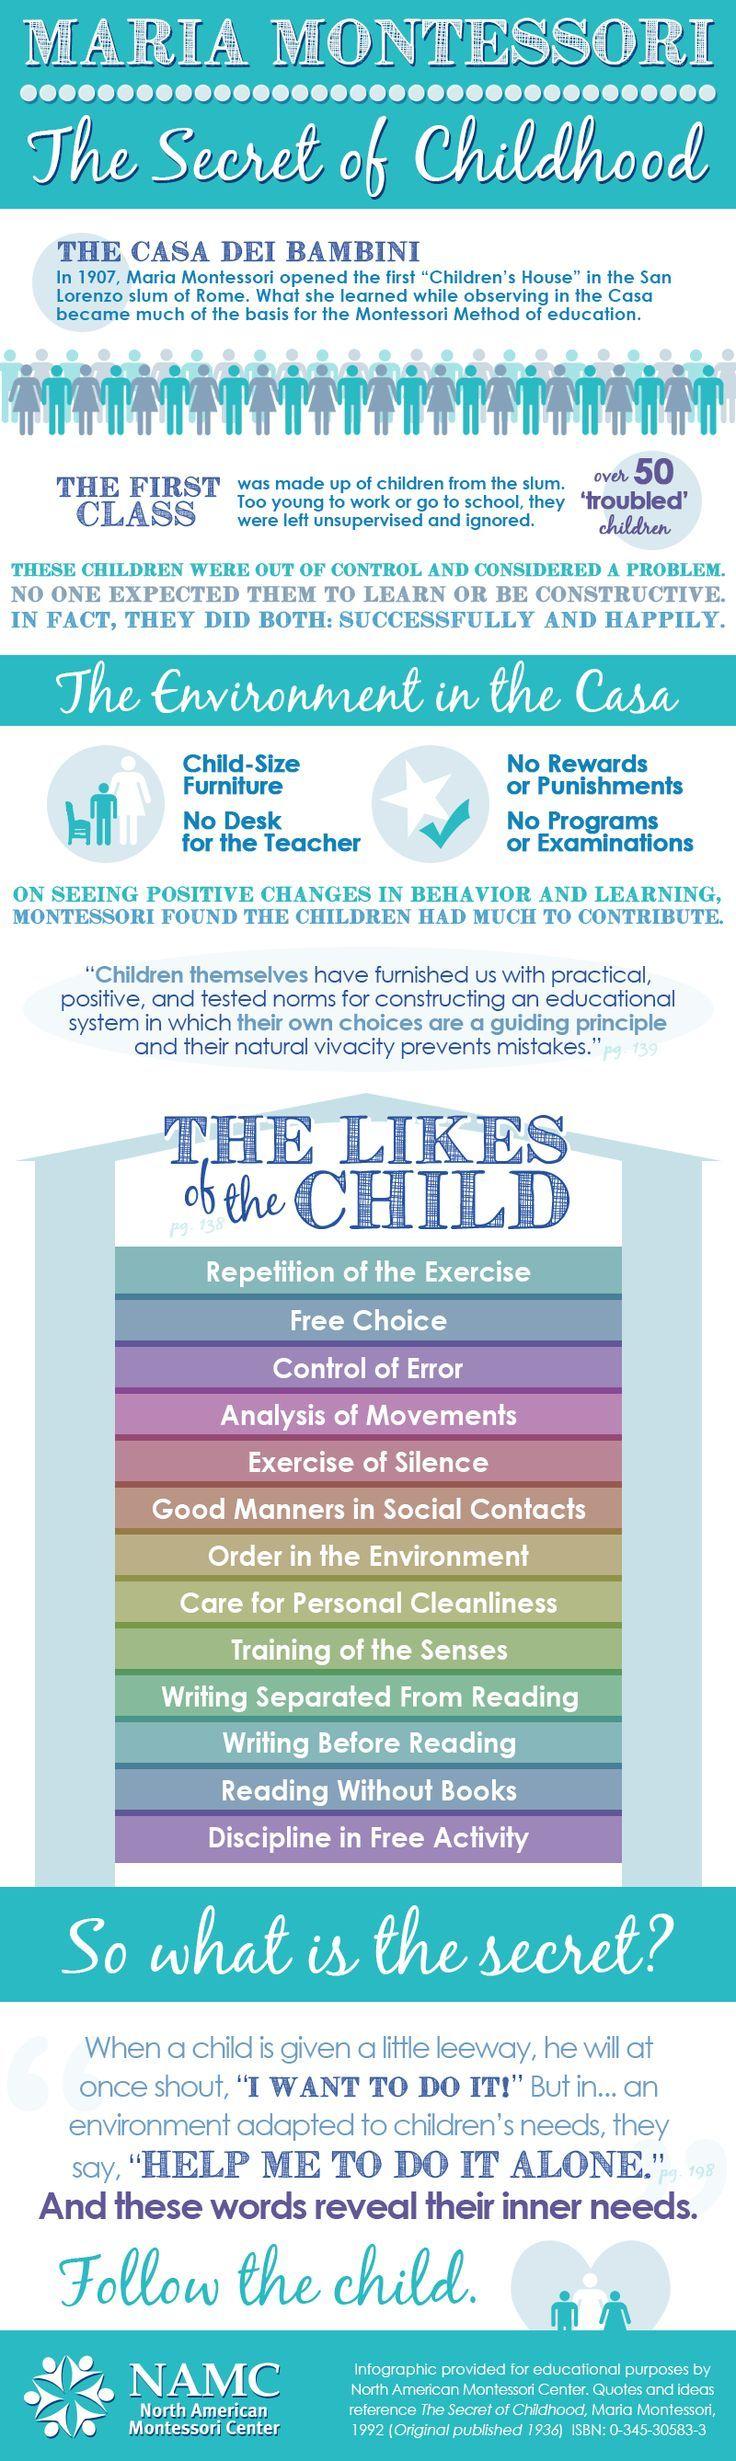 NAMC Montessori Secret of childhood infographic on Montessori Education!  FABULOUS!